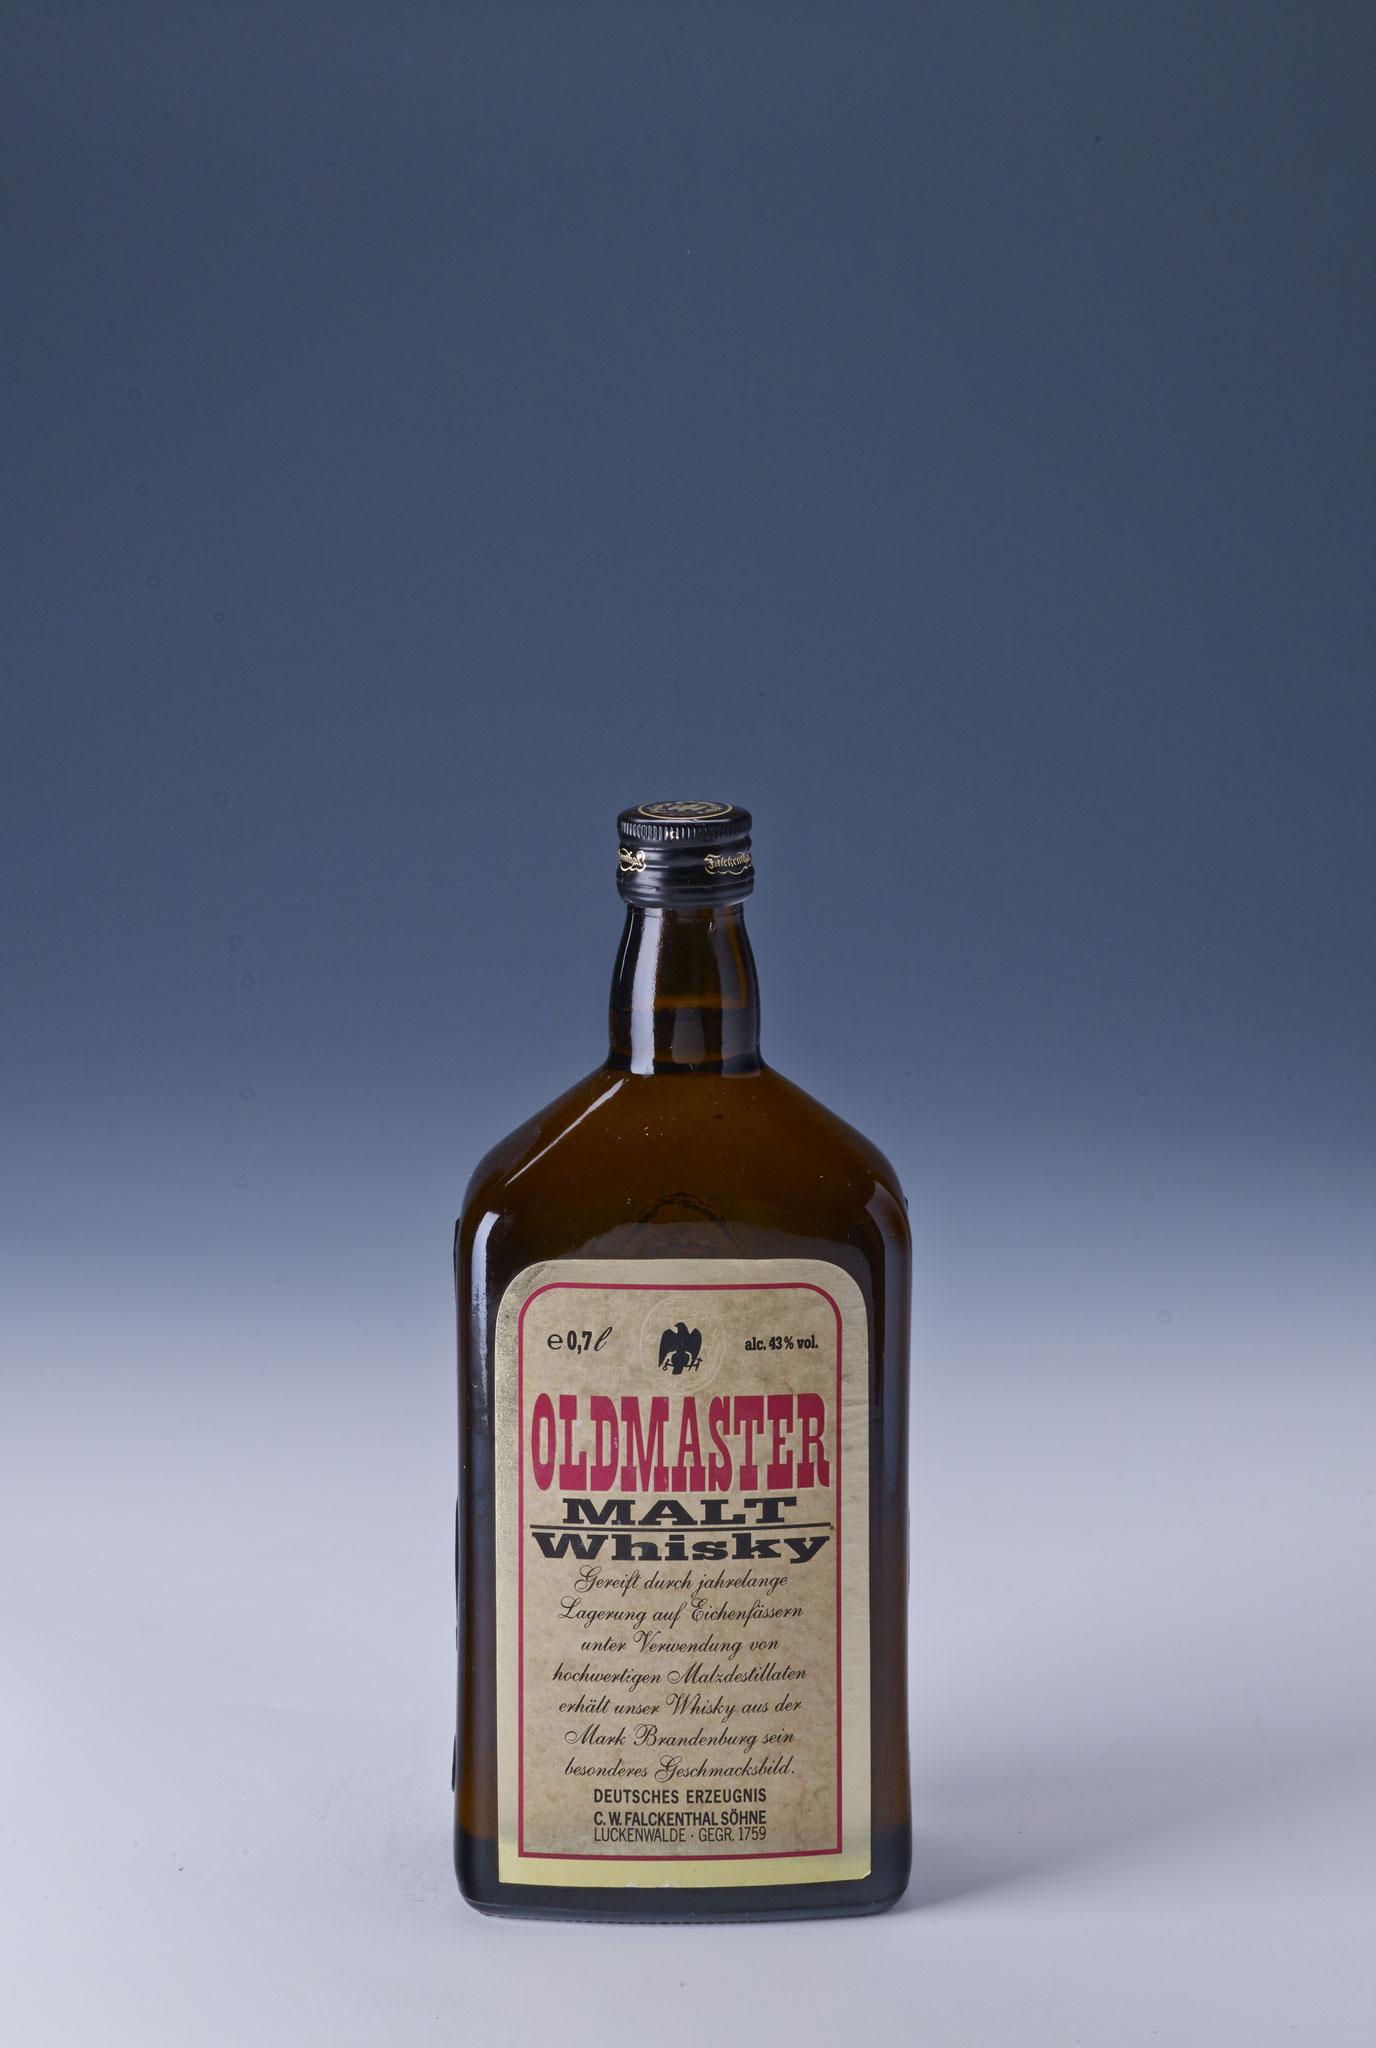 C.W.Falckenthal Söhne Luckenwalde